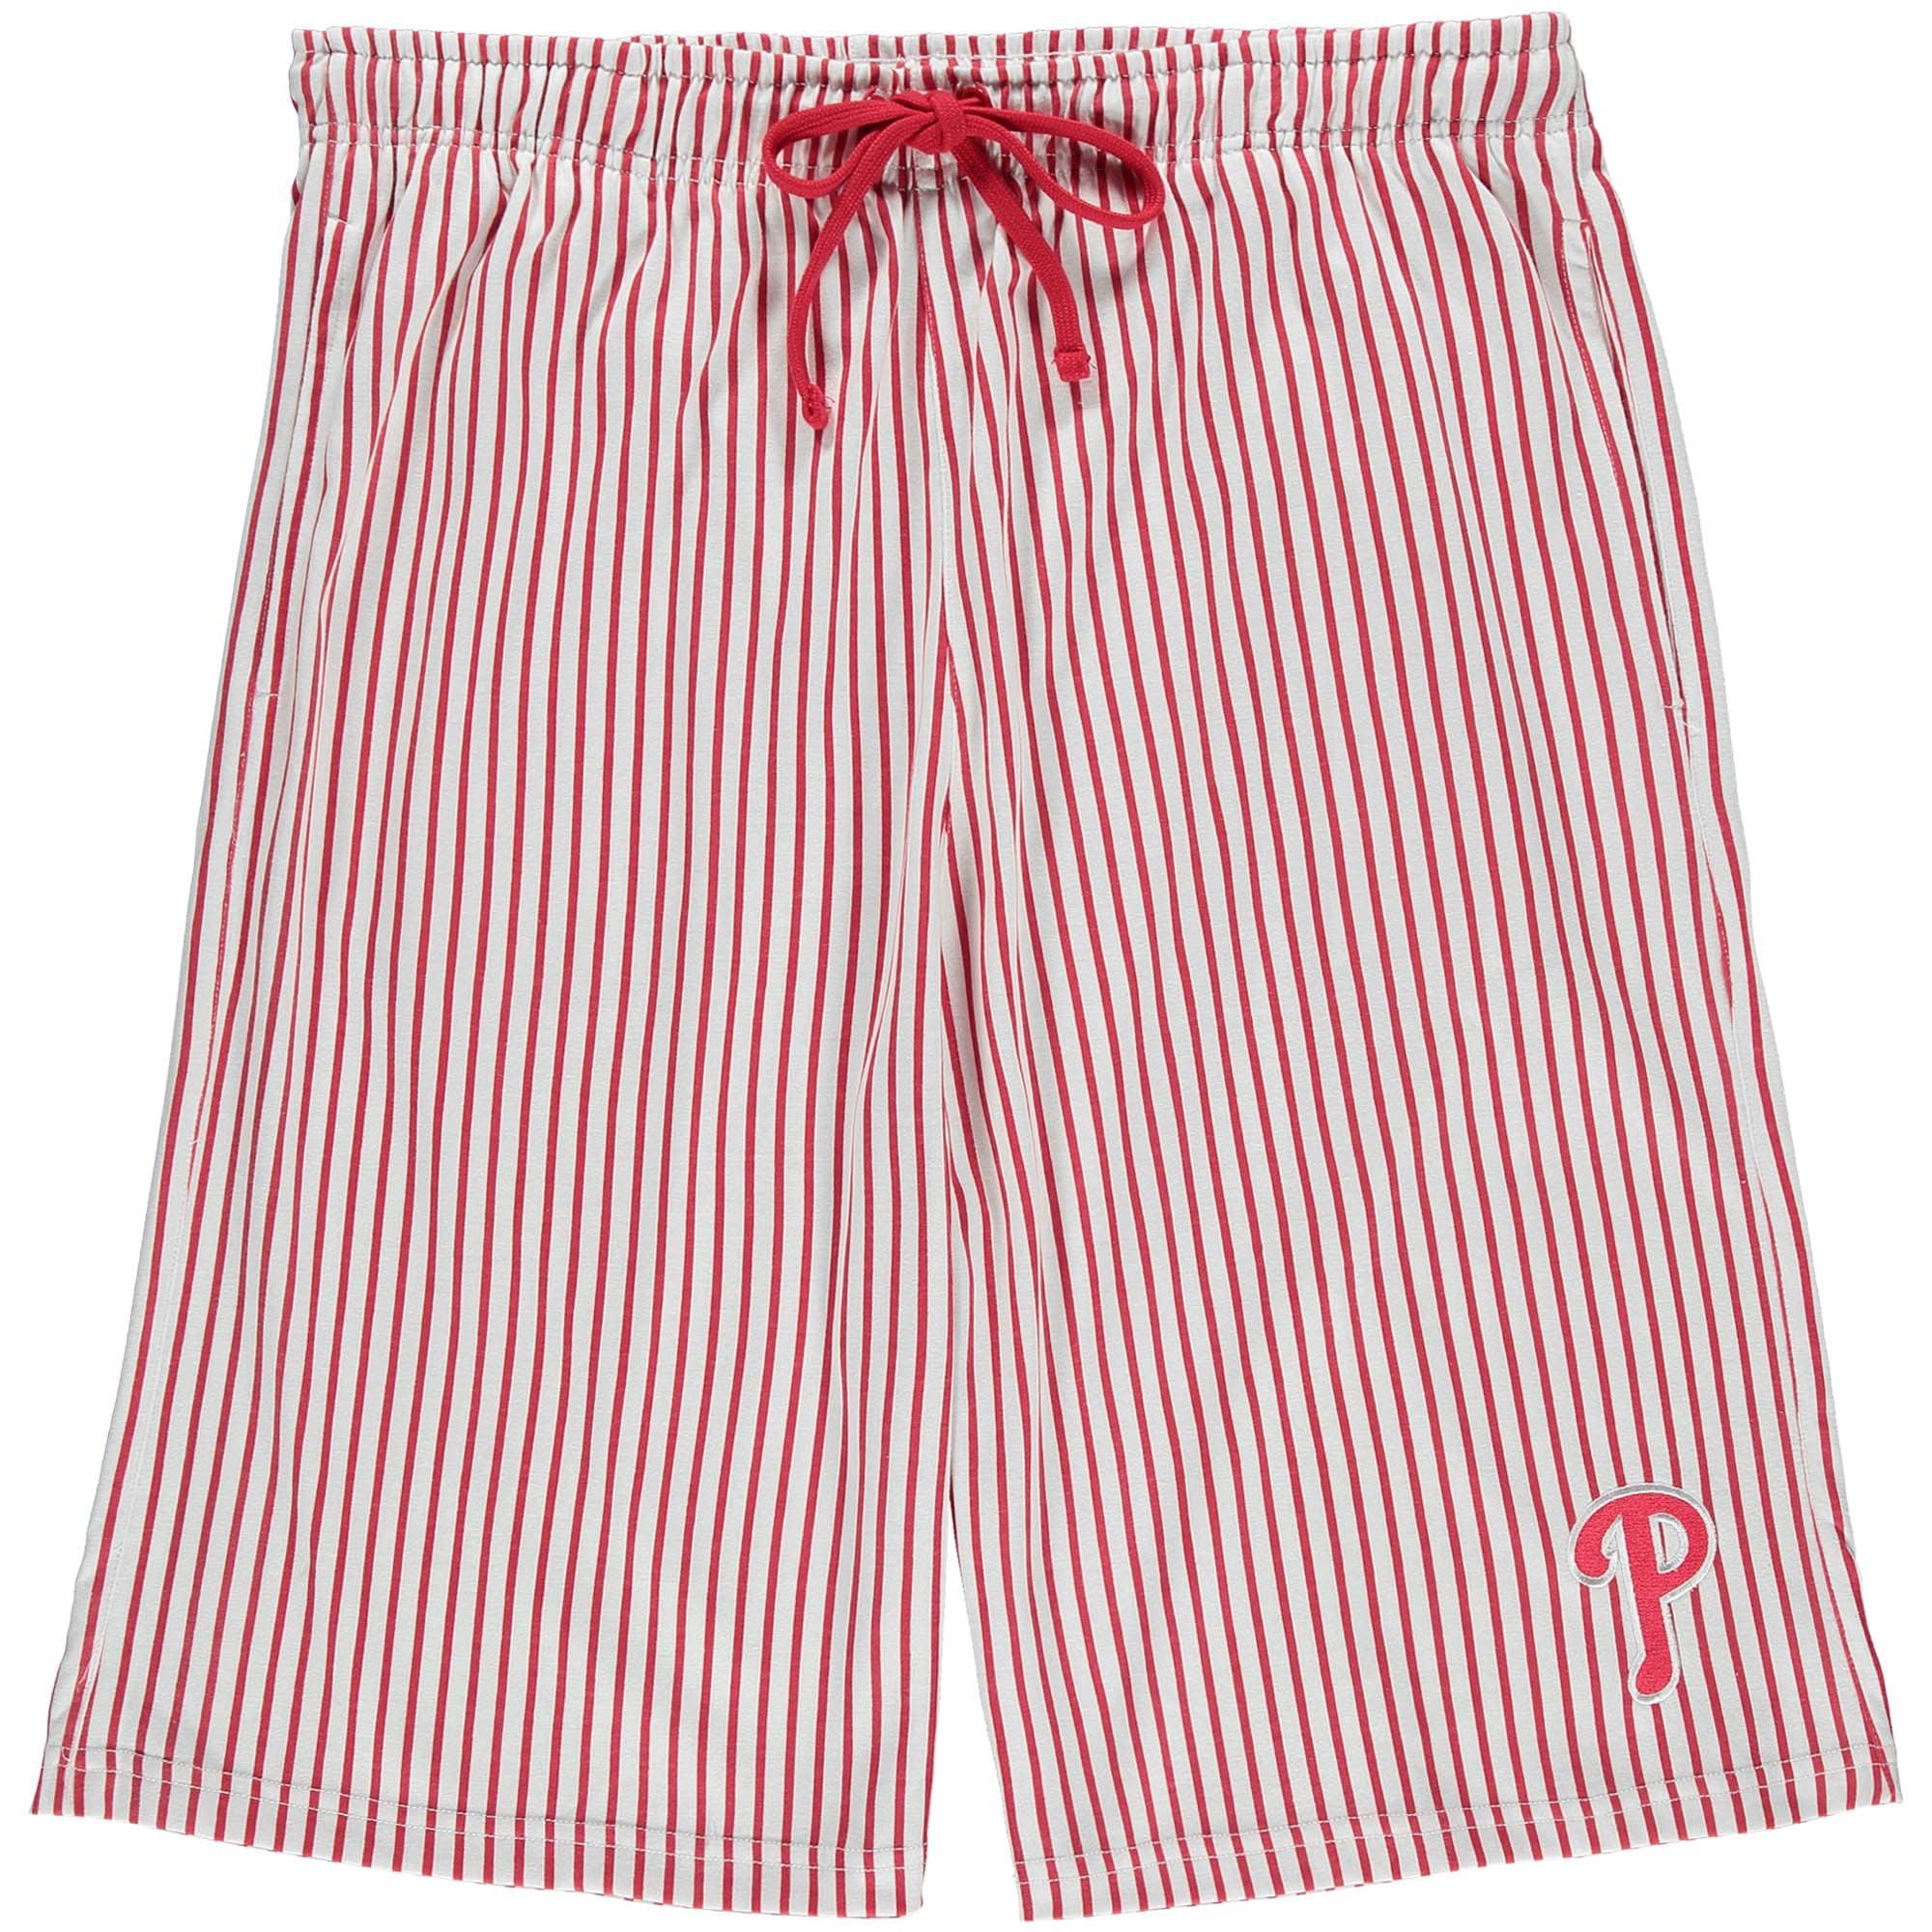 Philadelphia Phillies Big & Tall Pinstripe Shorts - White/Scarlet